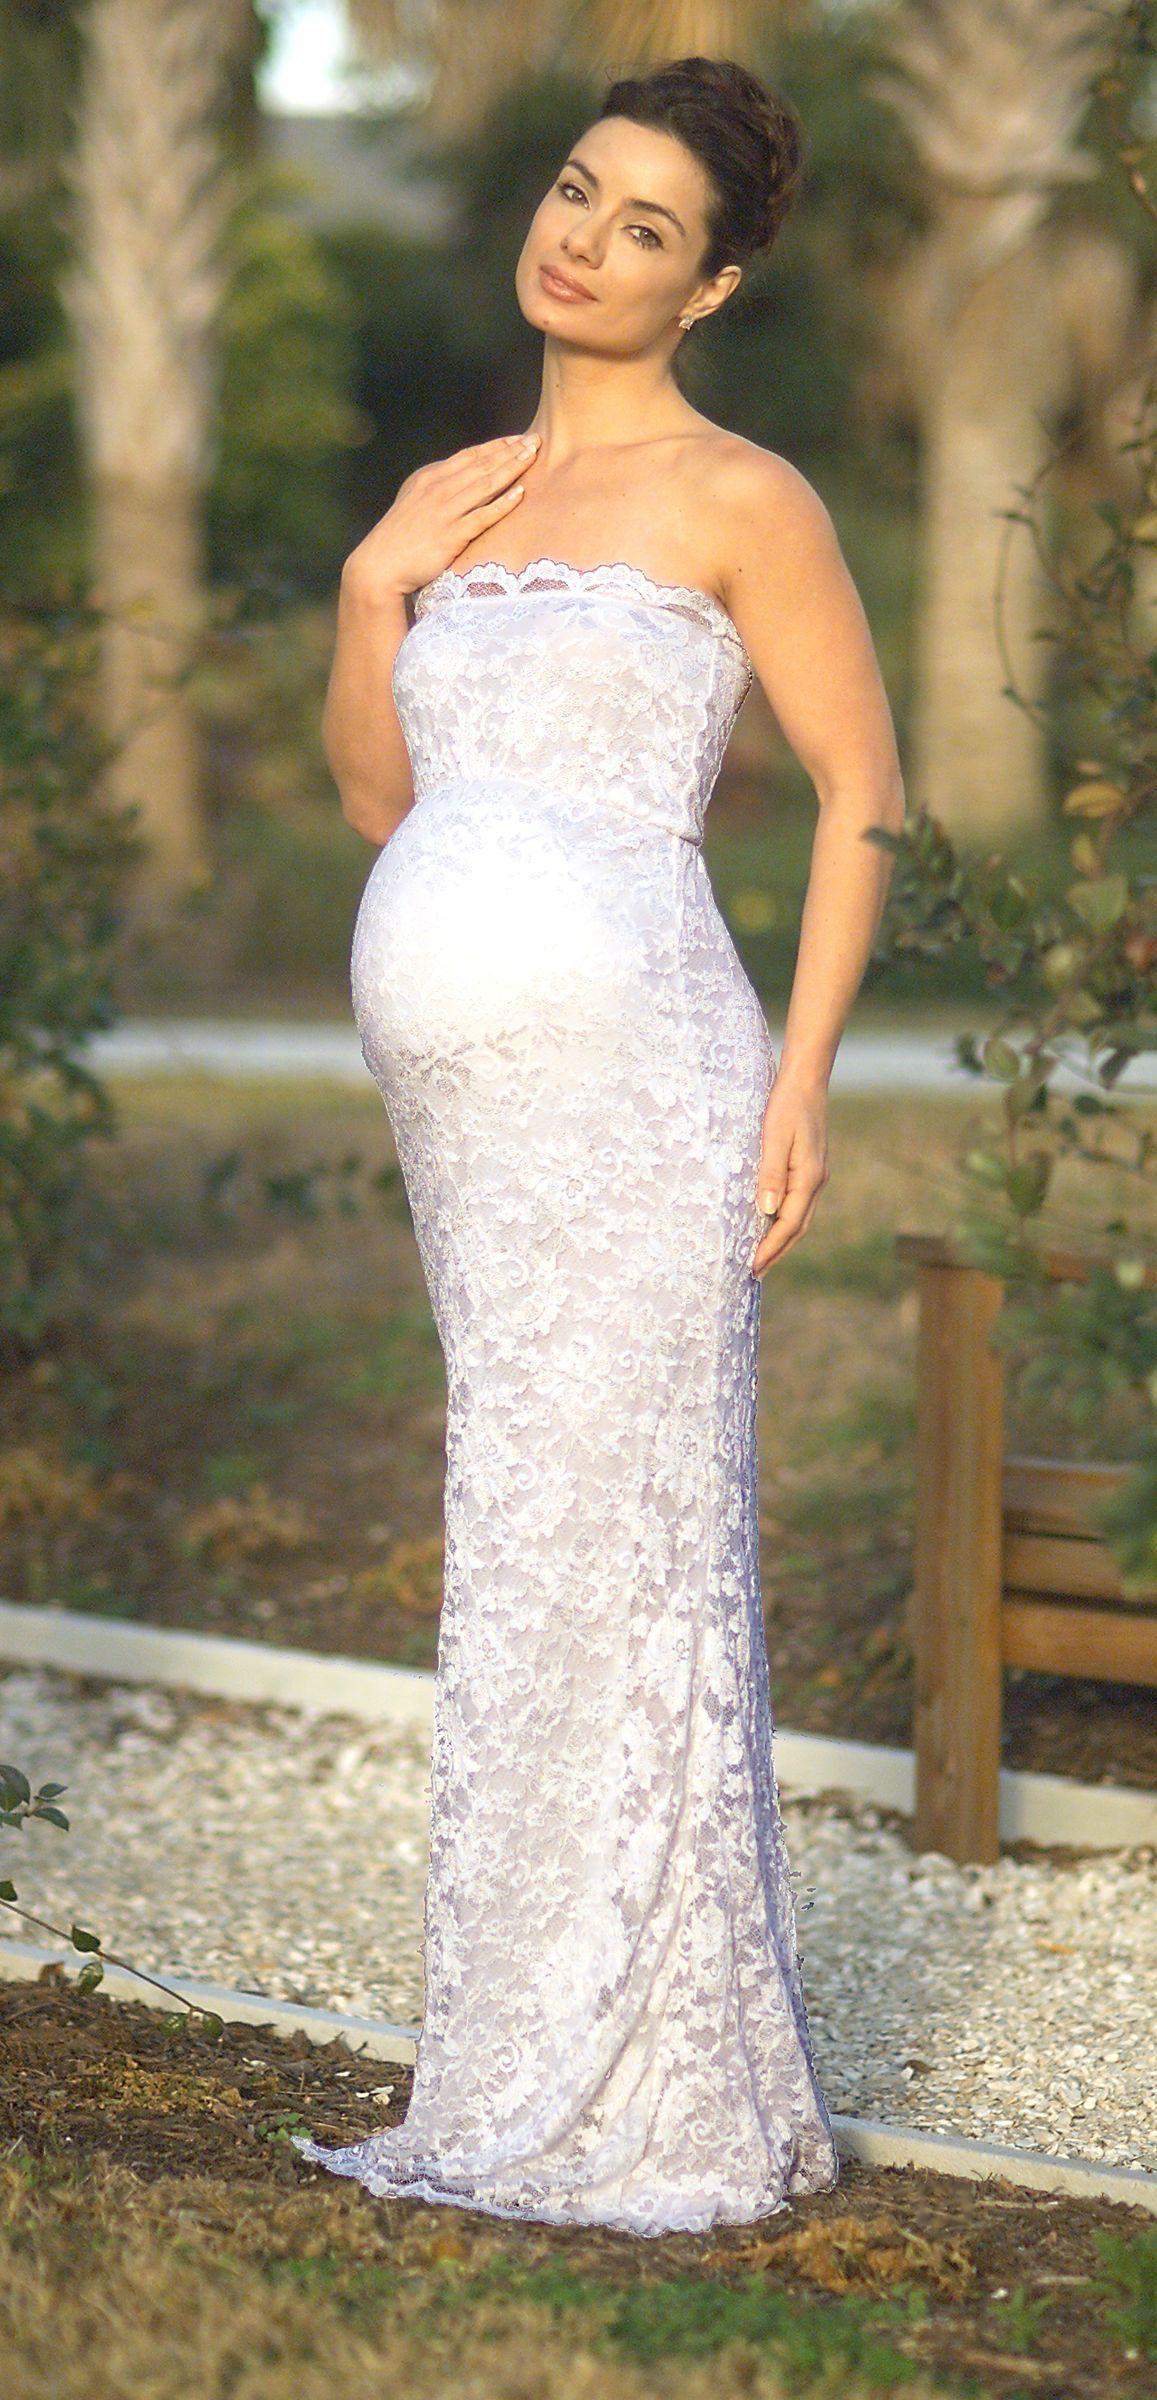 Short maternity wedding dresses  maternityweddingdresssheathfloorlength  Maternity Bridal Gowns